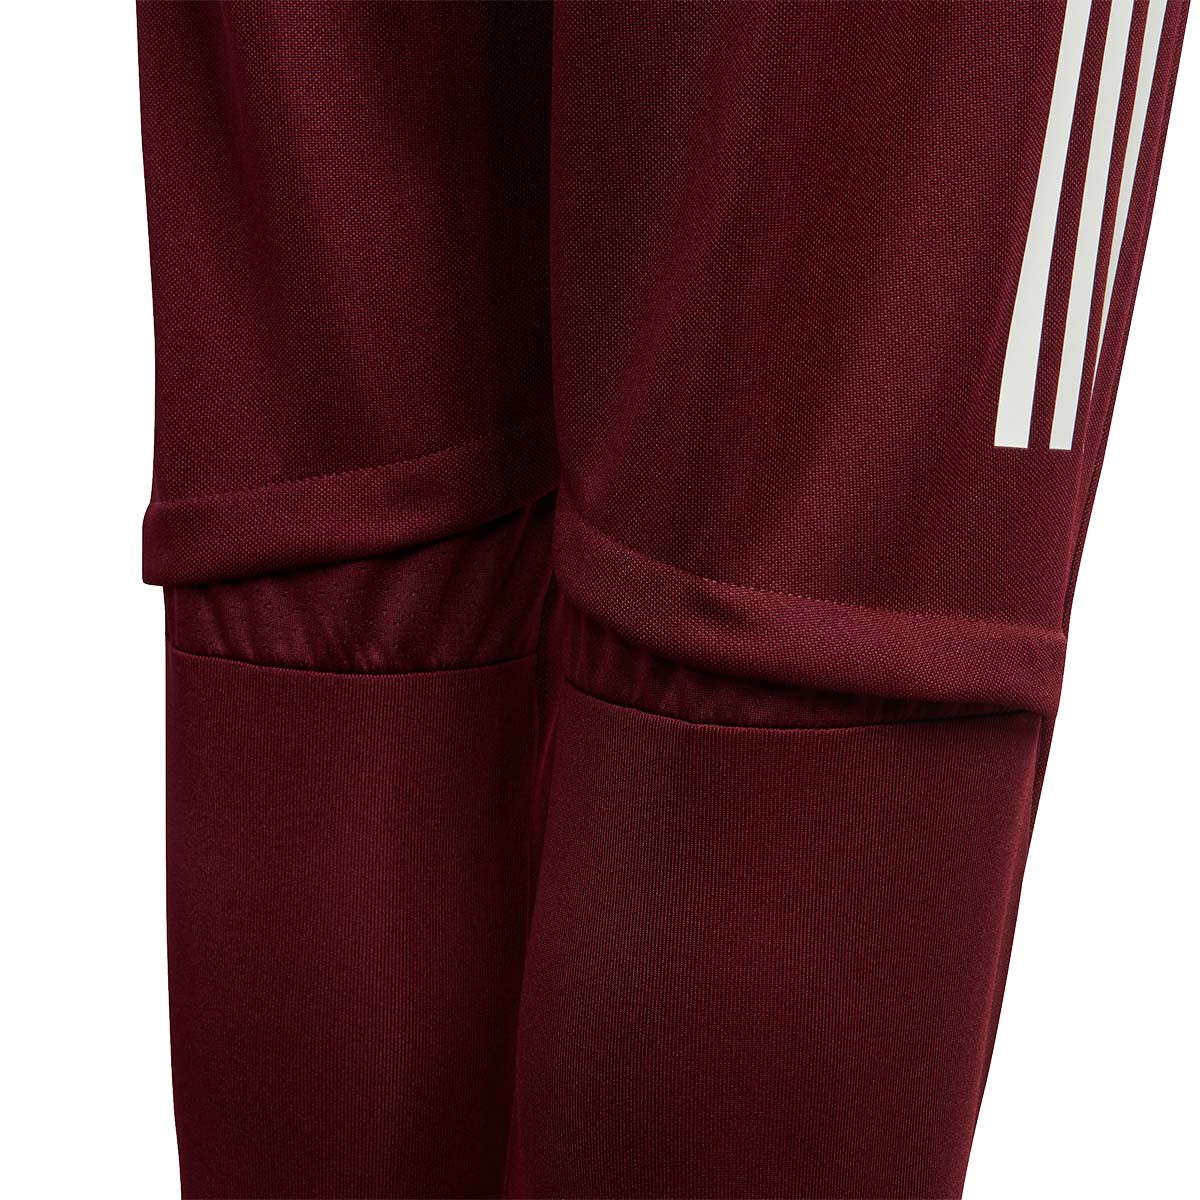 Long Pants Adidas Real Madrid European Training 2020 2021 Maroon Futbol Emotion